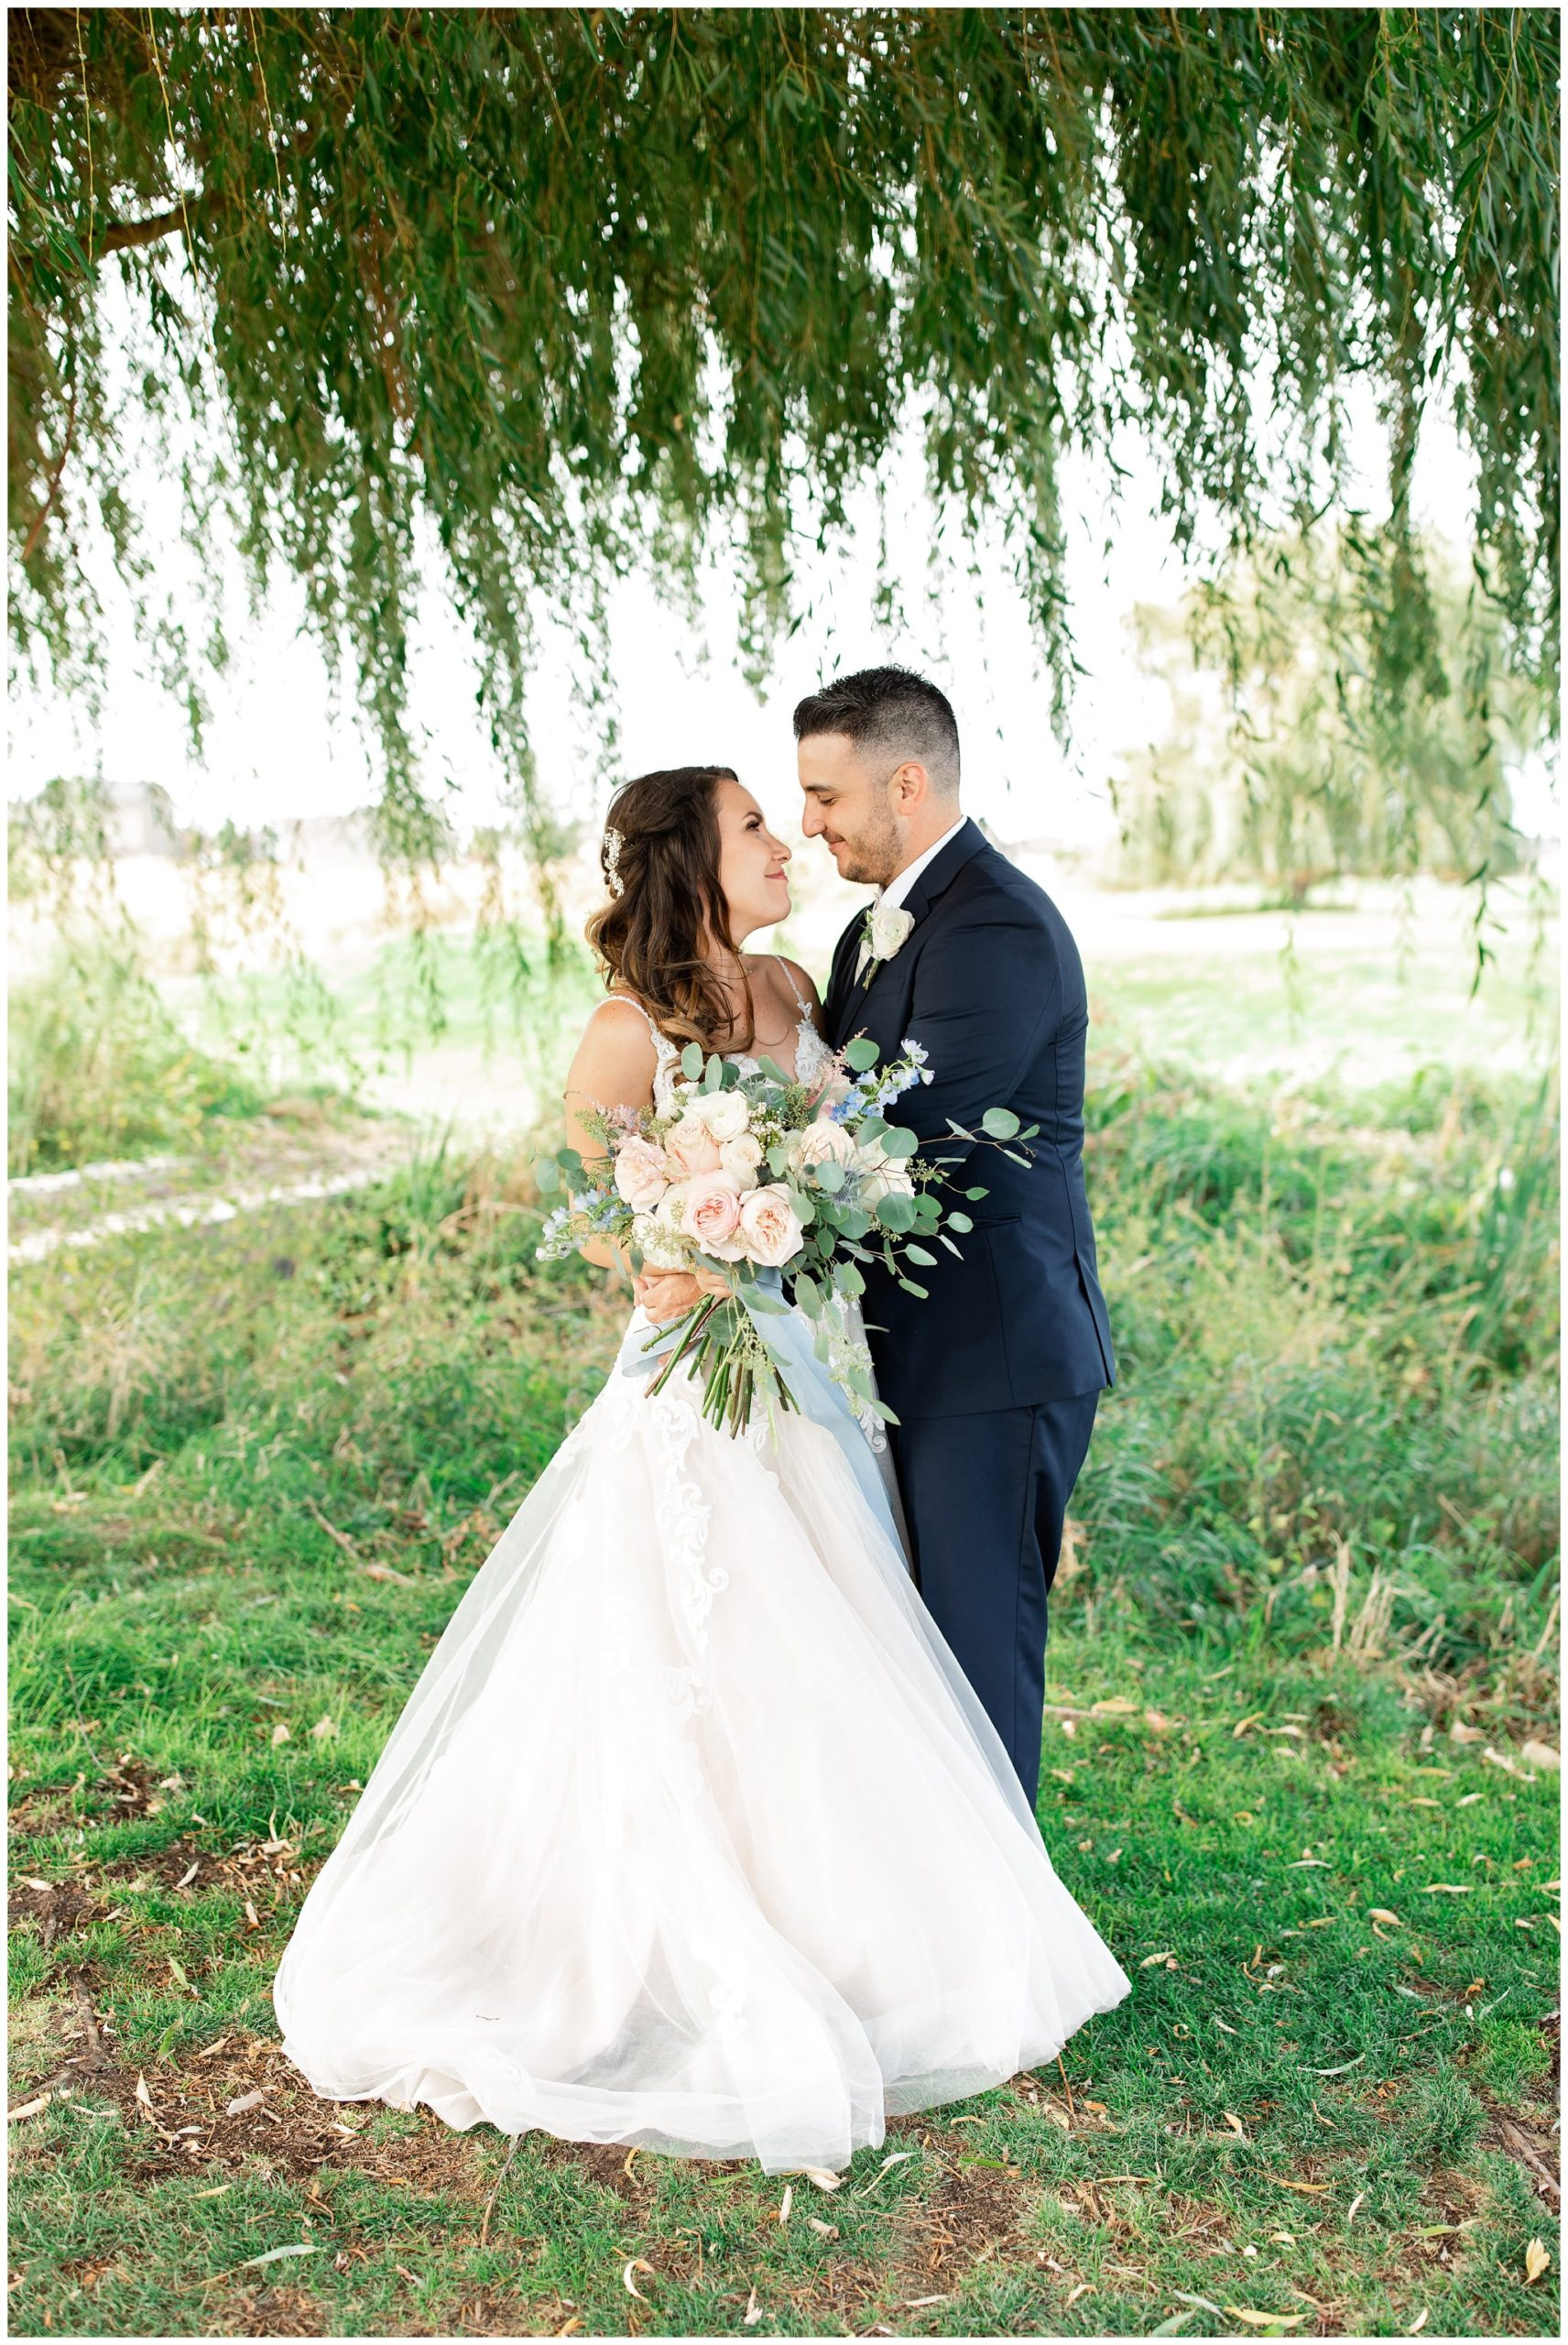 Bride and groom under the willow tree at Sleepy Ridge